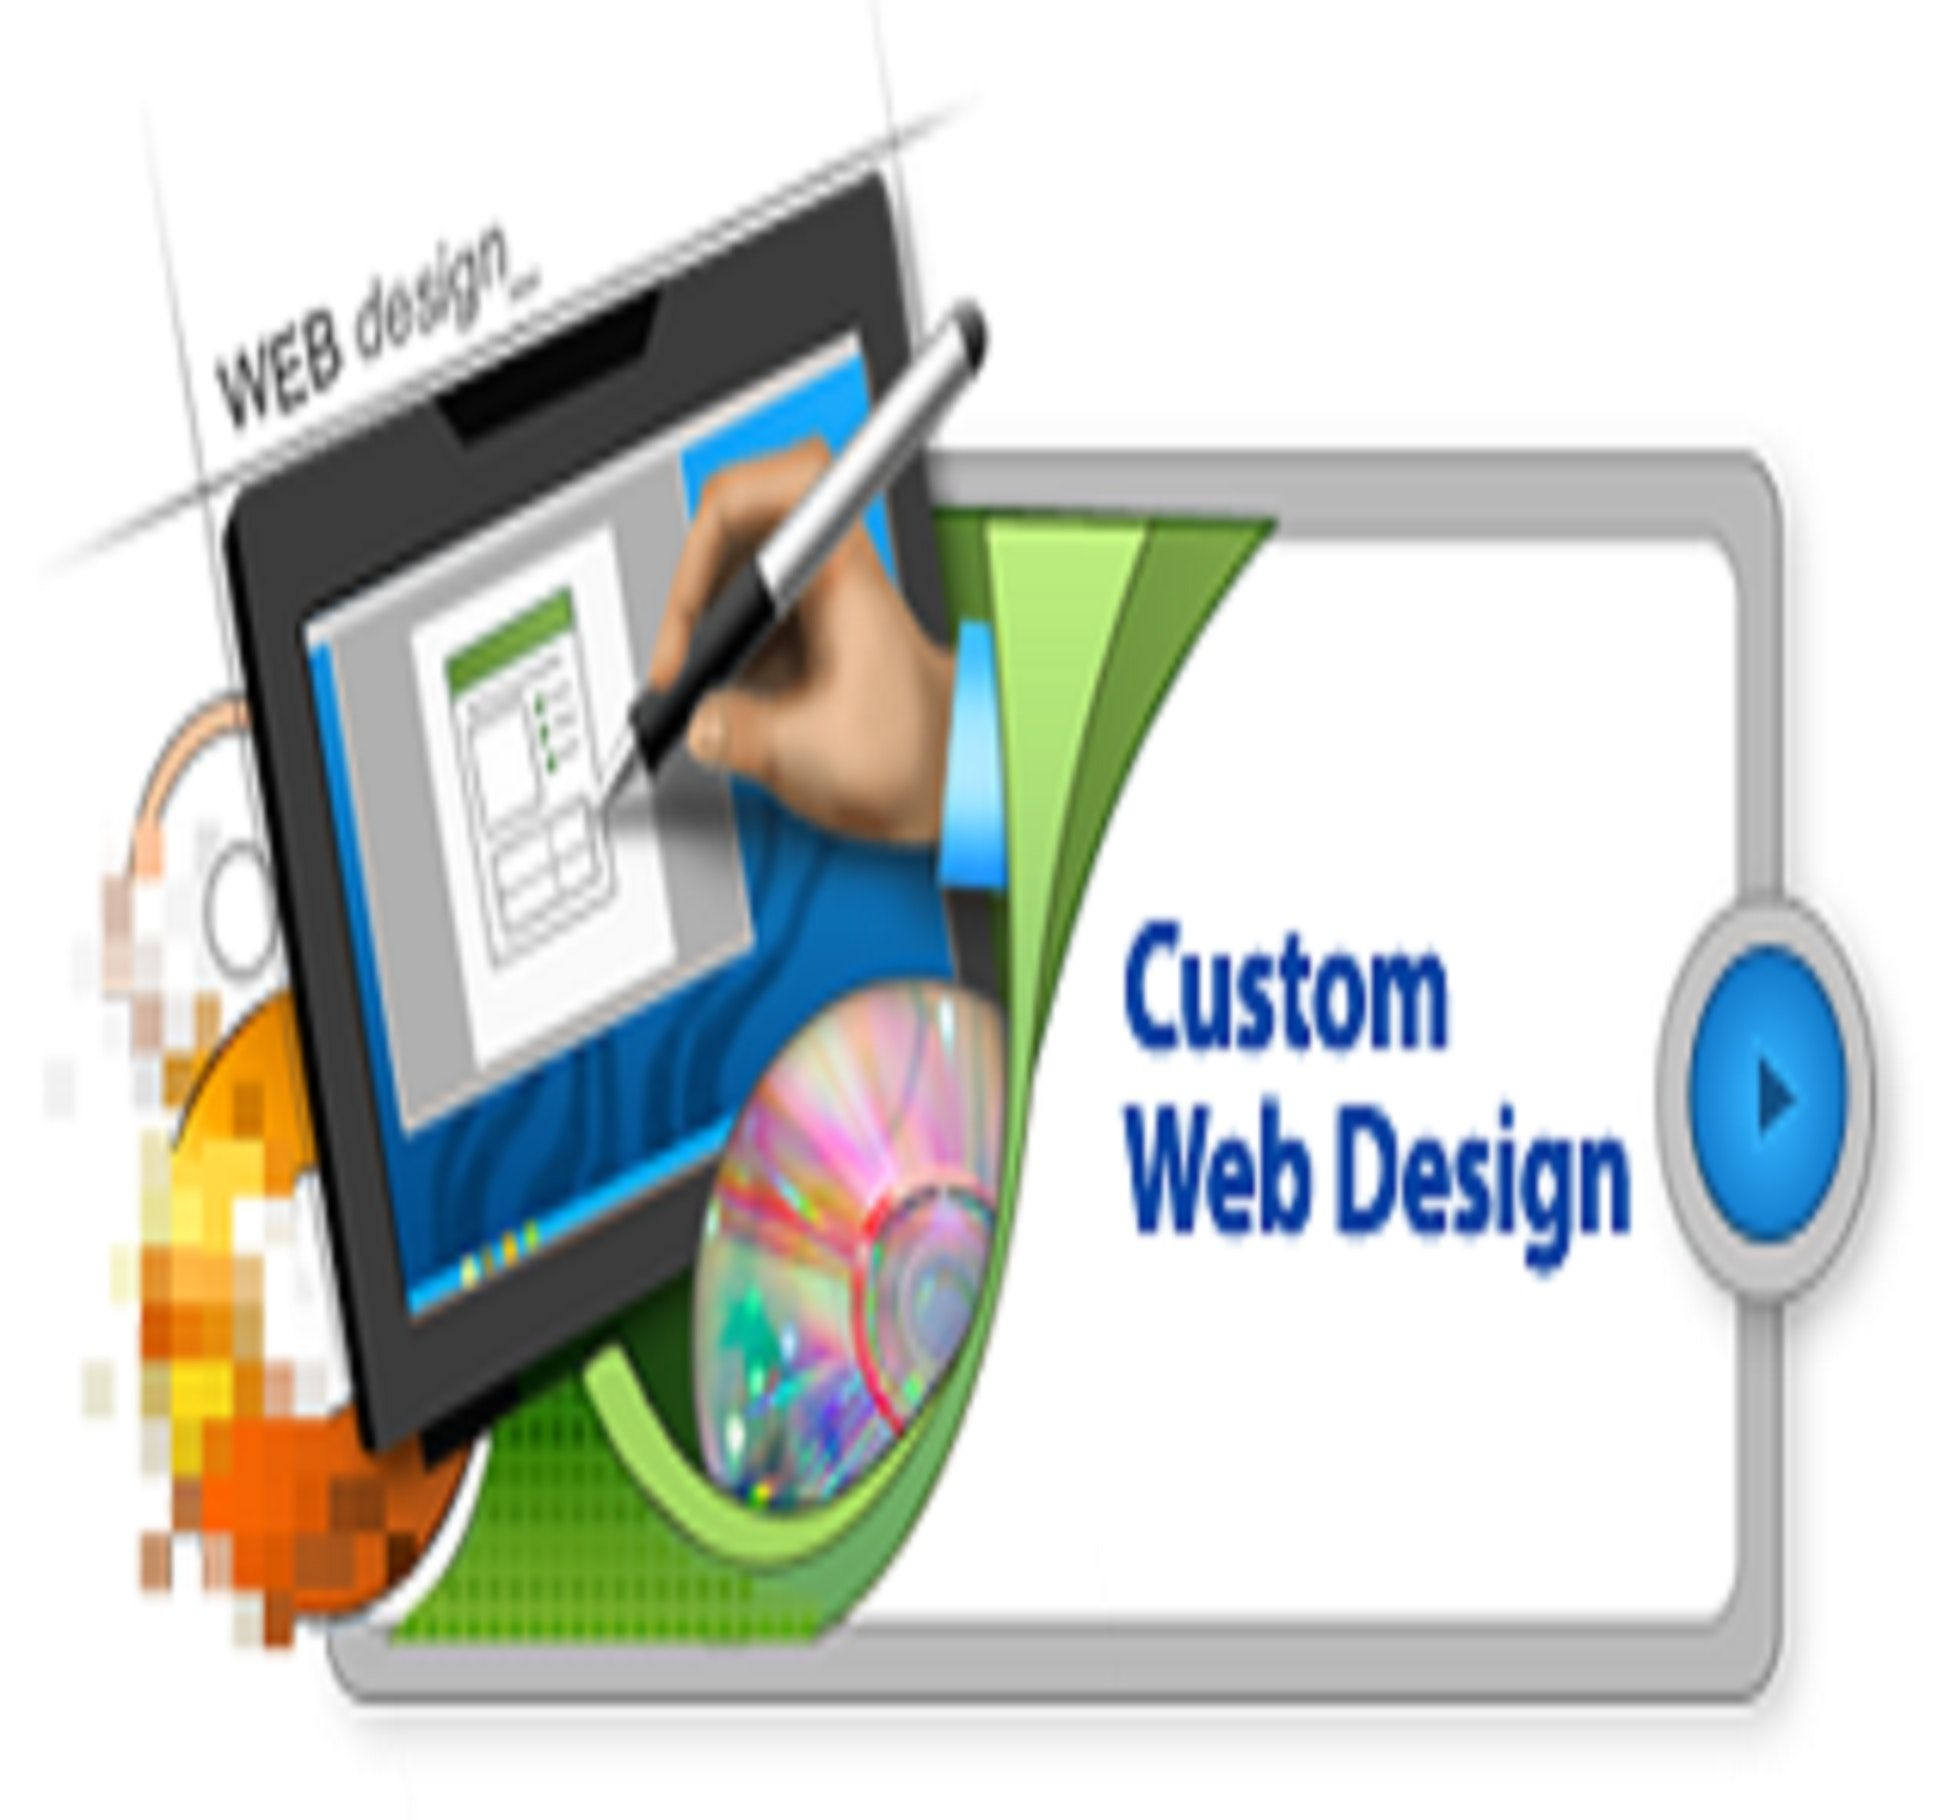 Fort Worth Website Design With Images Custom Web Design Website Design Company Web Design Services